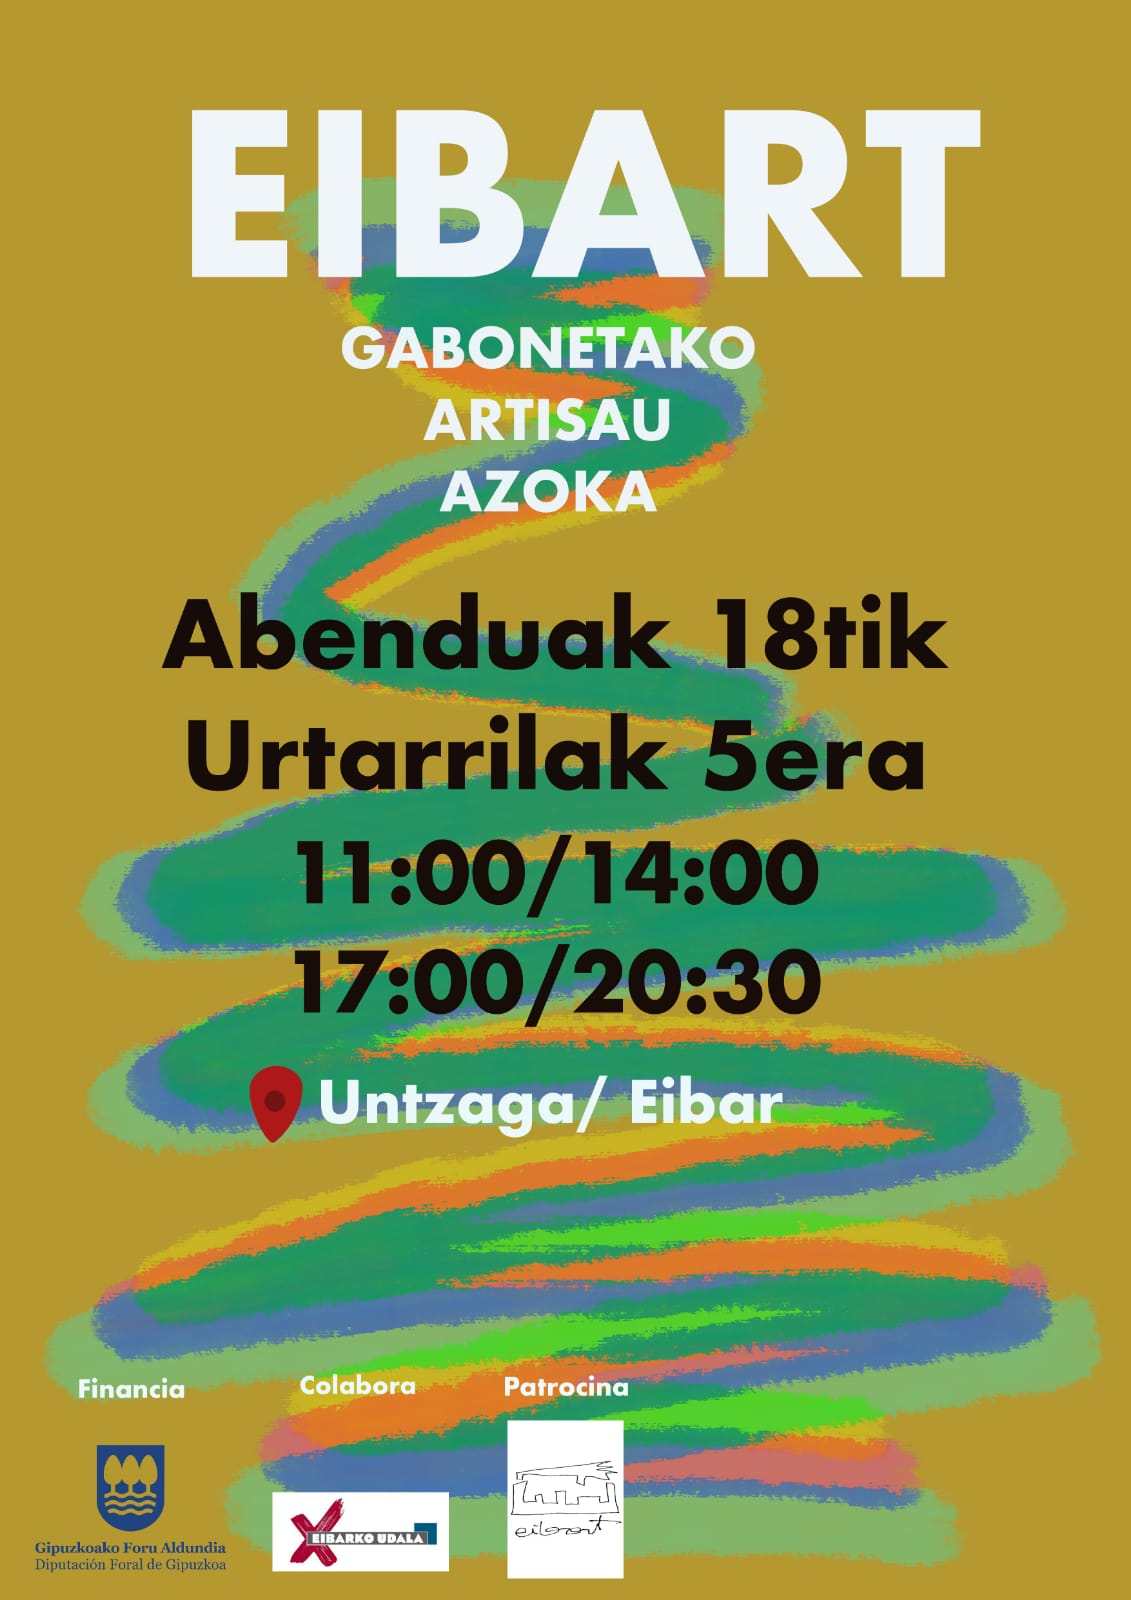 Cartel feria de navidad EIBART 2020 en Eibar - ESKULAN